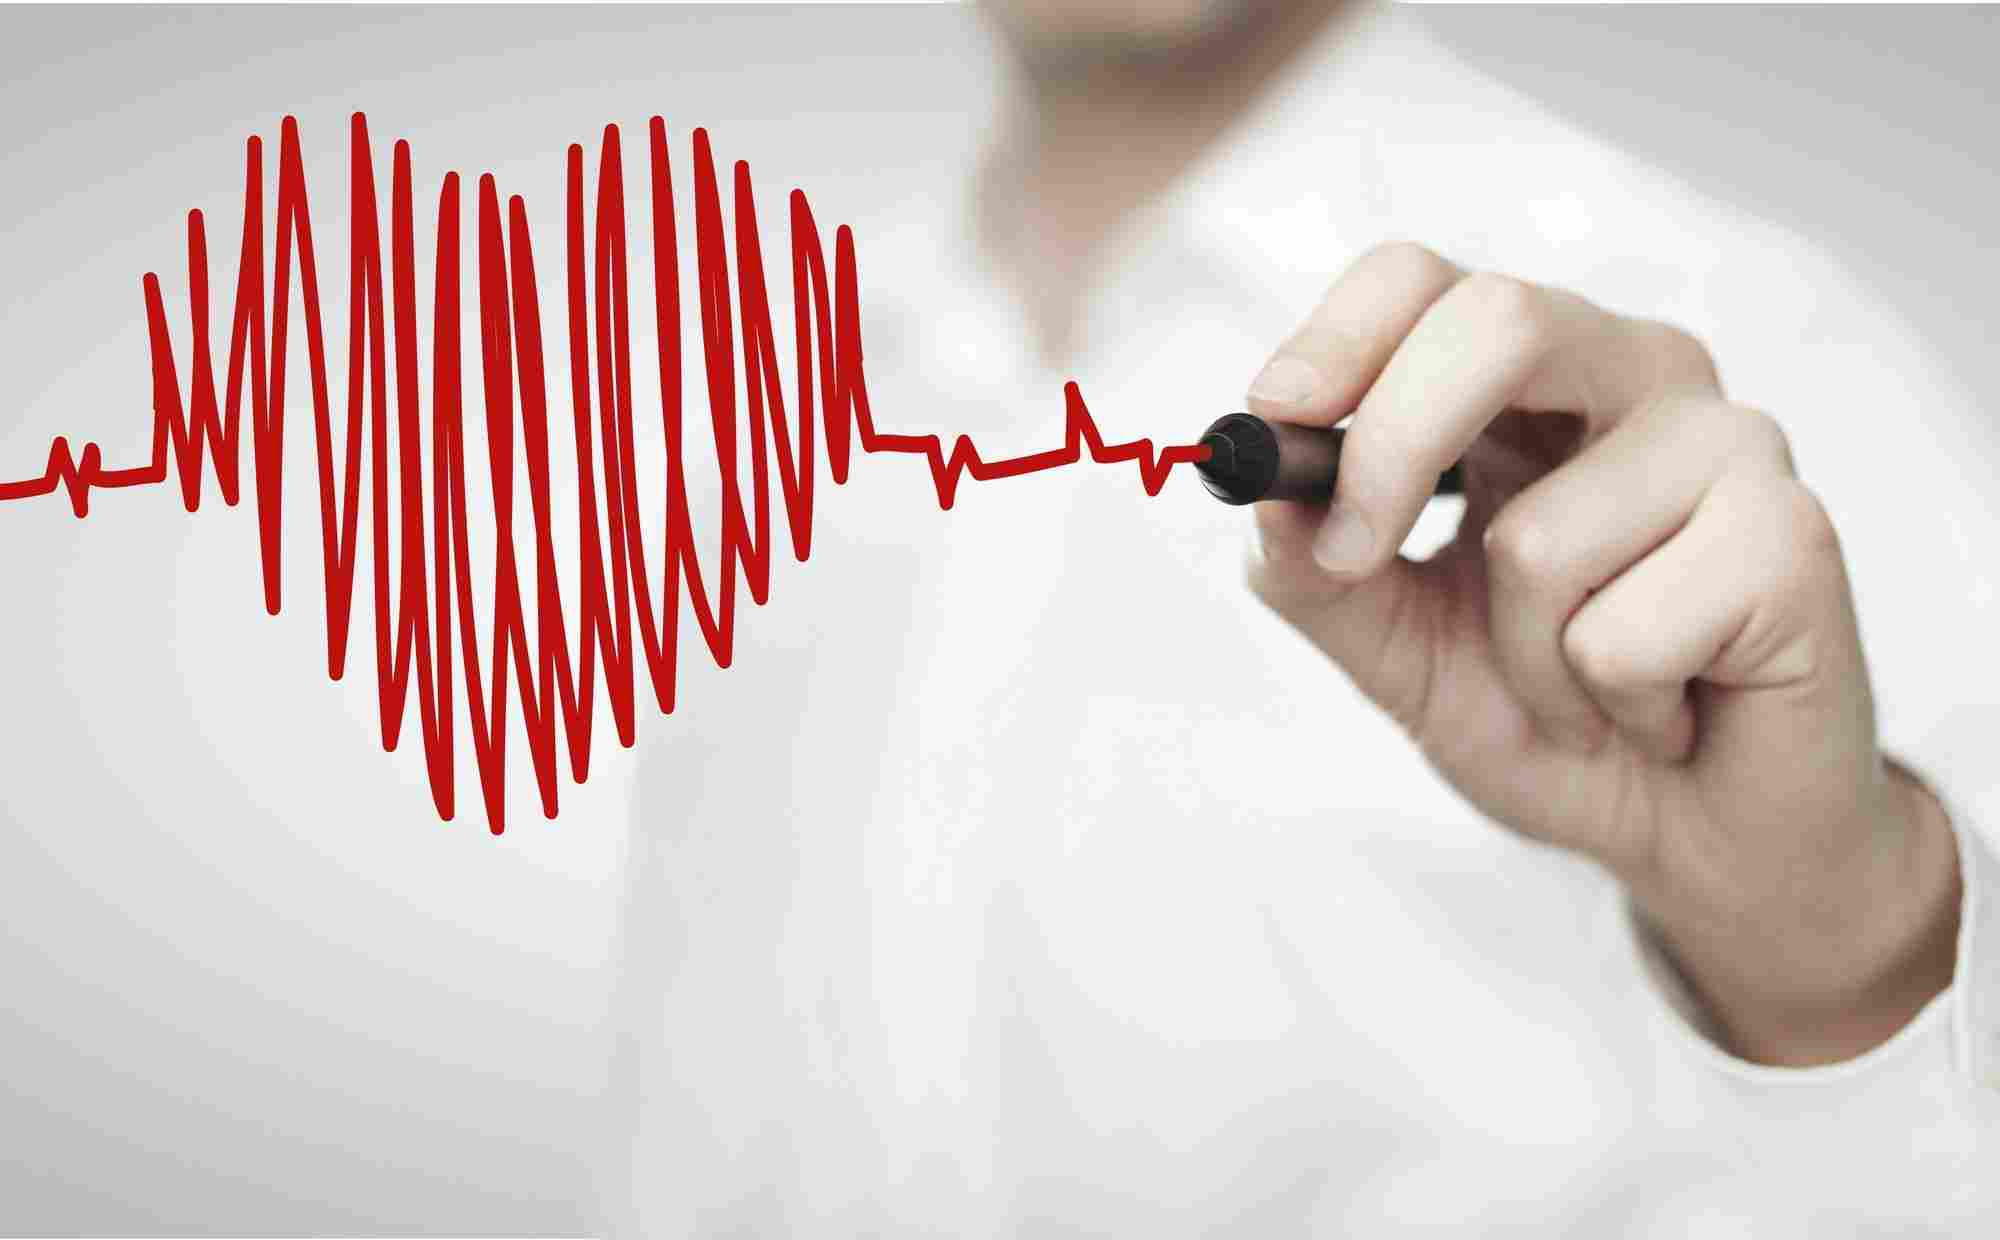 https://www.hakanbayraktar.com.tr/wp-content/uploads/2015/12/heart-health-1.jpg